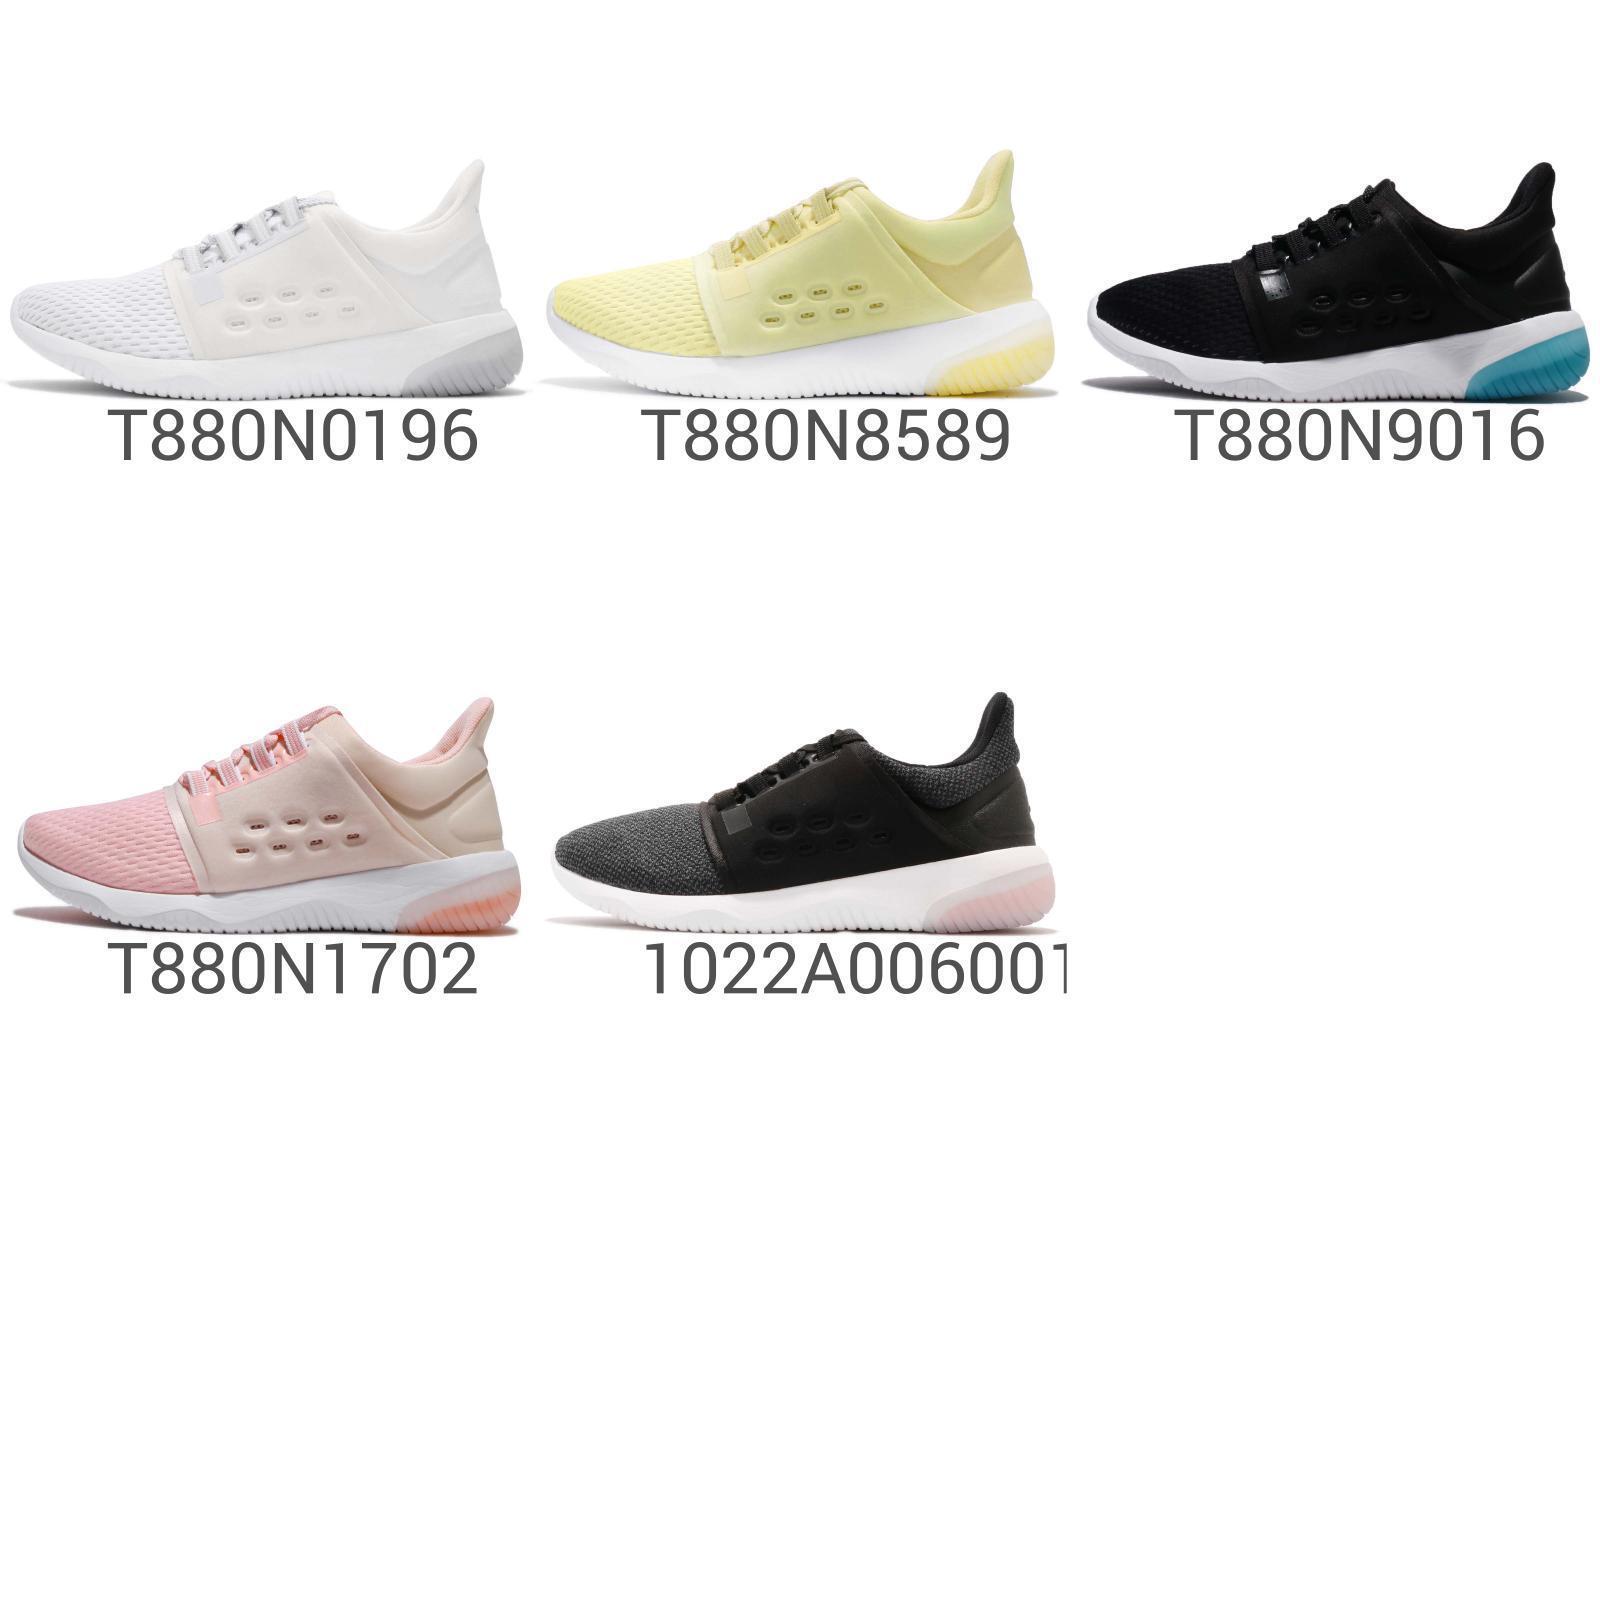 Asics Gel-Kenun Lyte   MX femmes Running chaussures Lifestyle baskets Pick 1